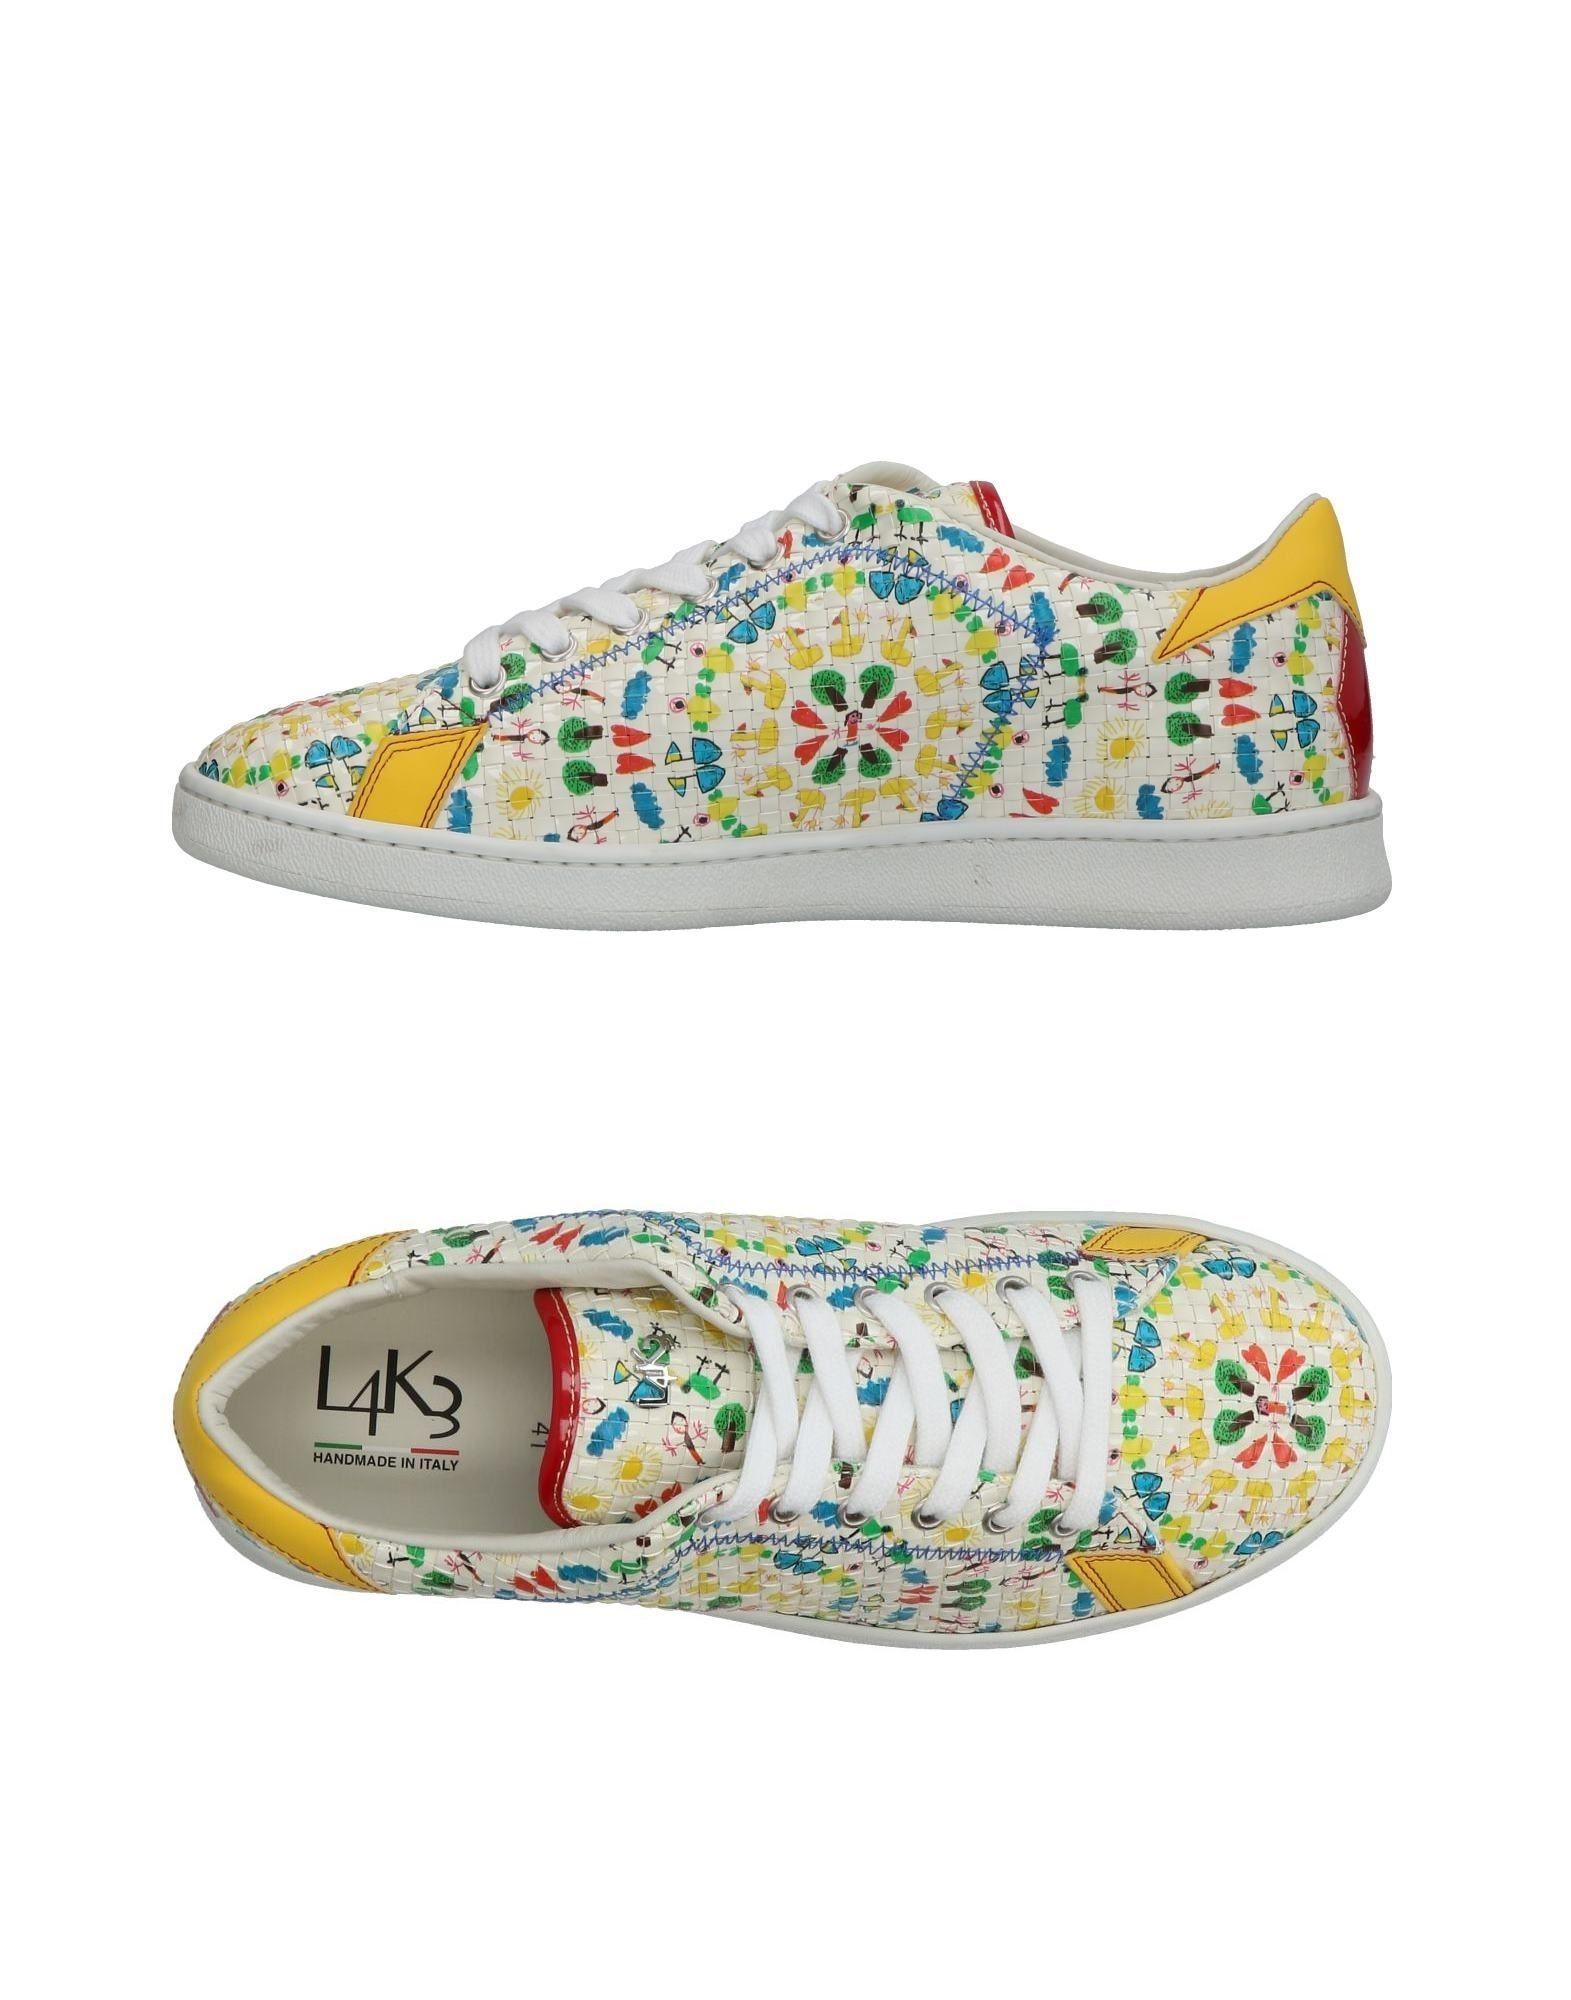 Moda Sneakers L4k3 L4k3 Sneakers Uomo - 11357512IF 8a7032